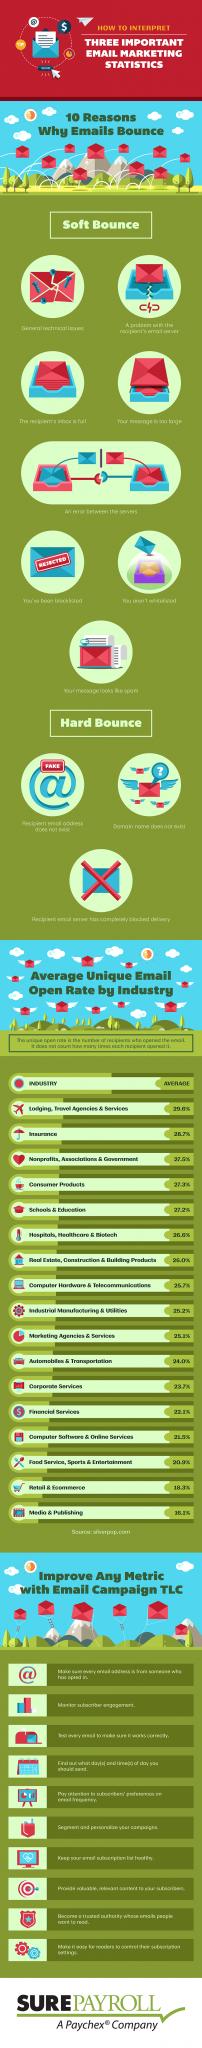 How to Interpret Three Important Email Marketing Statistics